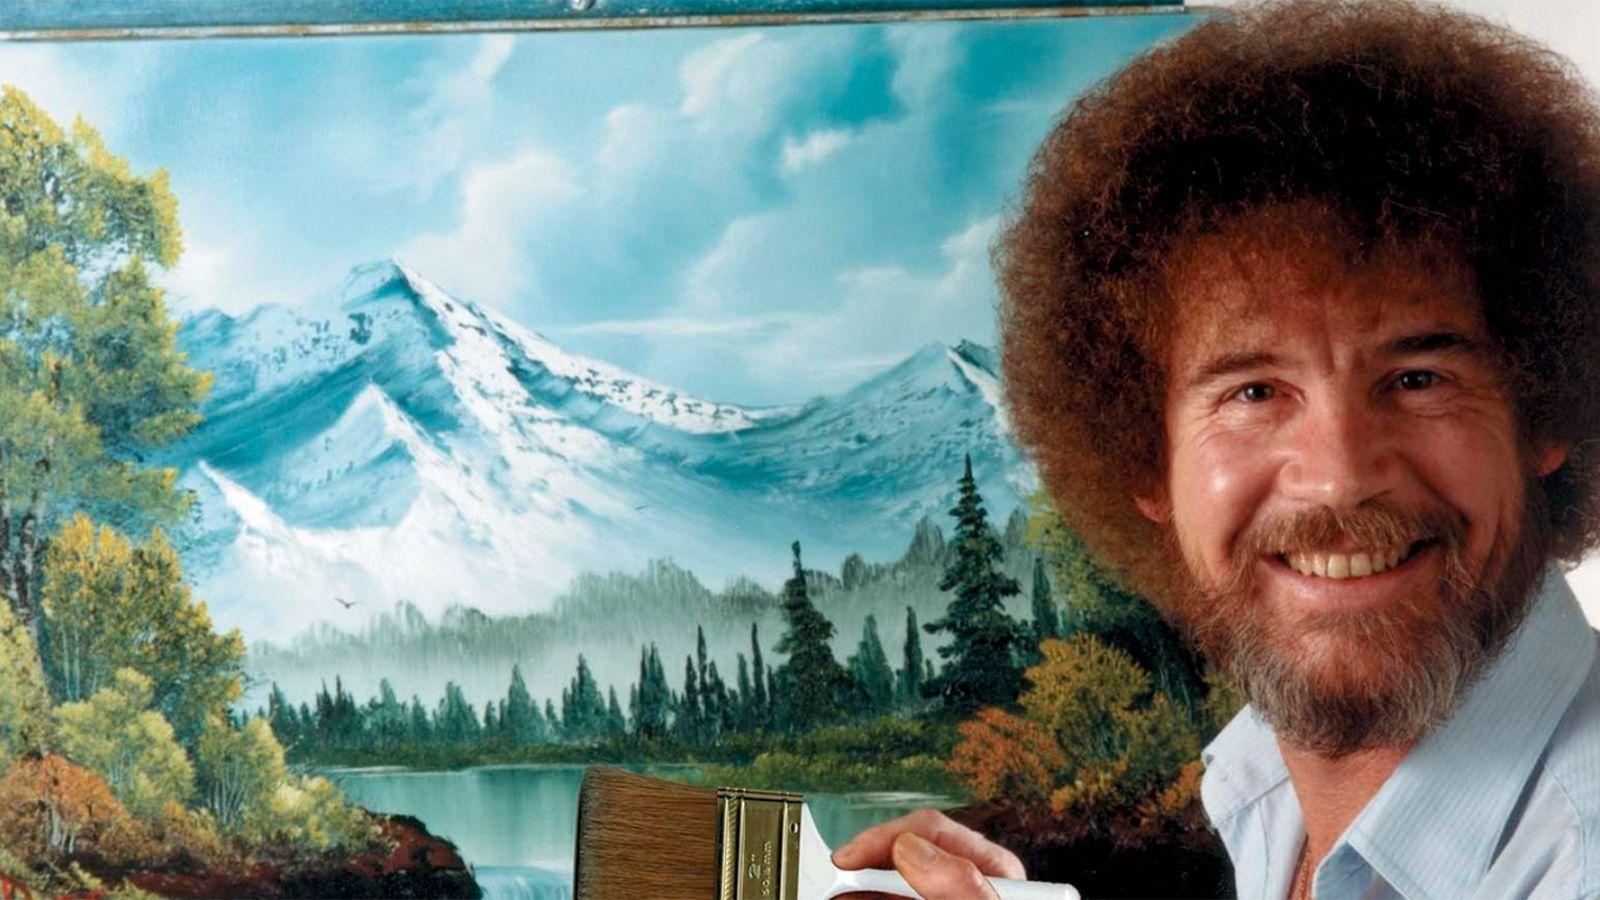 Fun Fall Desktop Wallpaper Twitch Bringing Bob Ross The Joy Of Painting Back Every